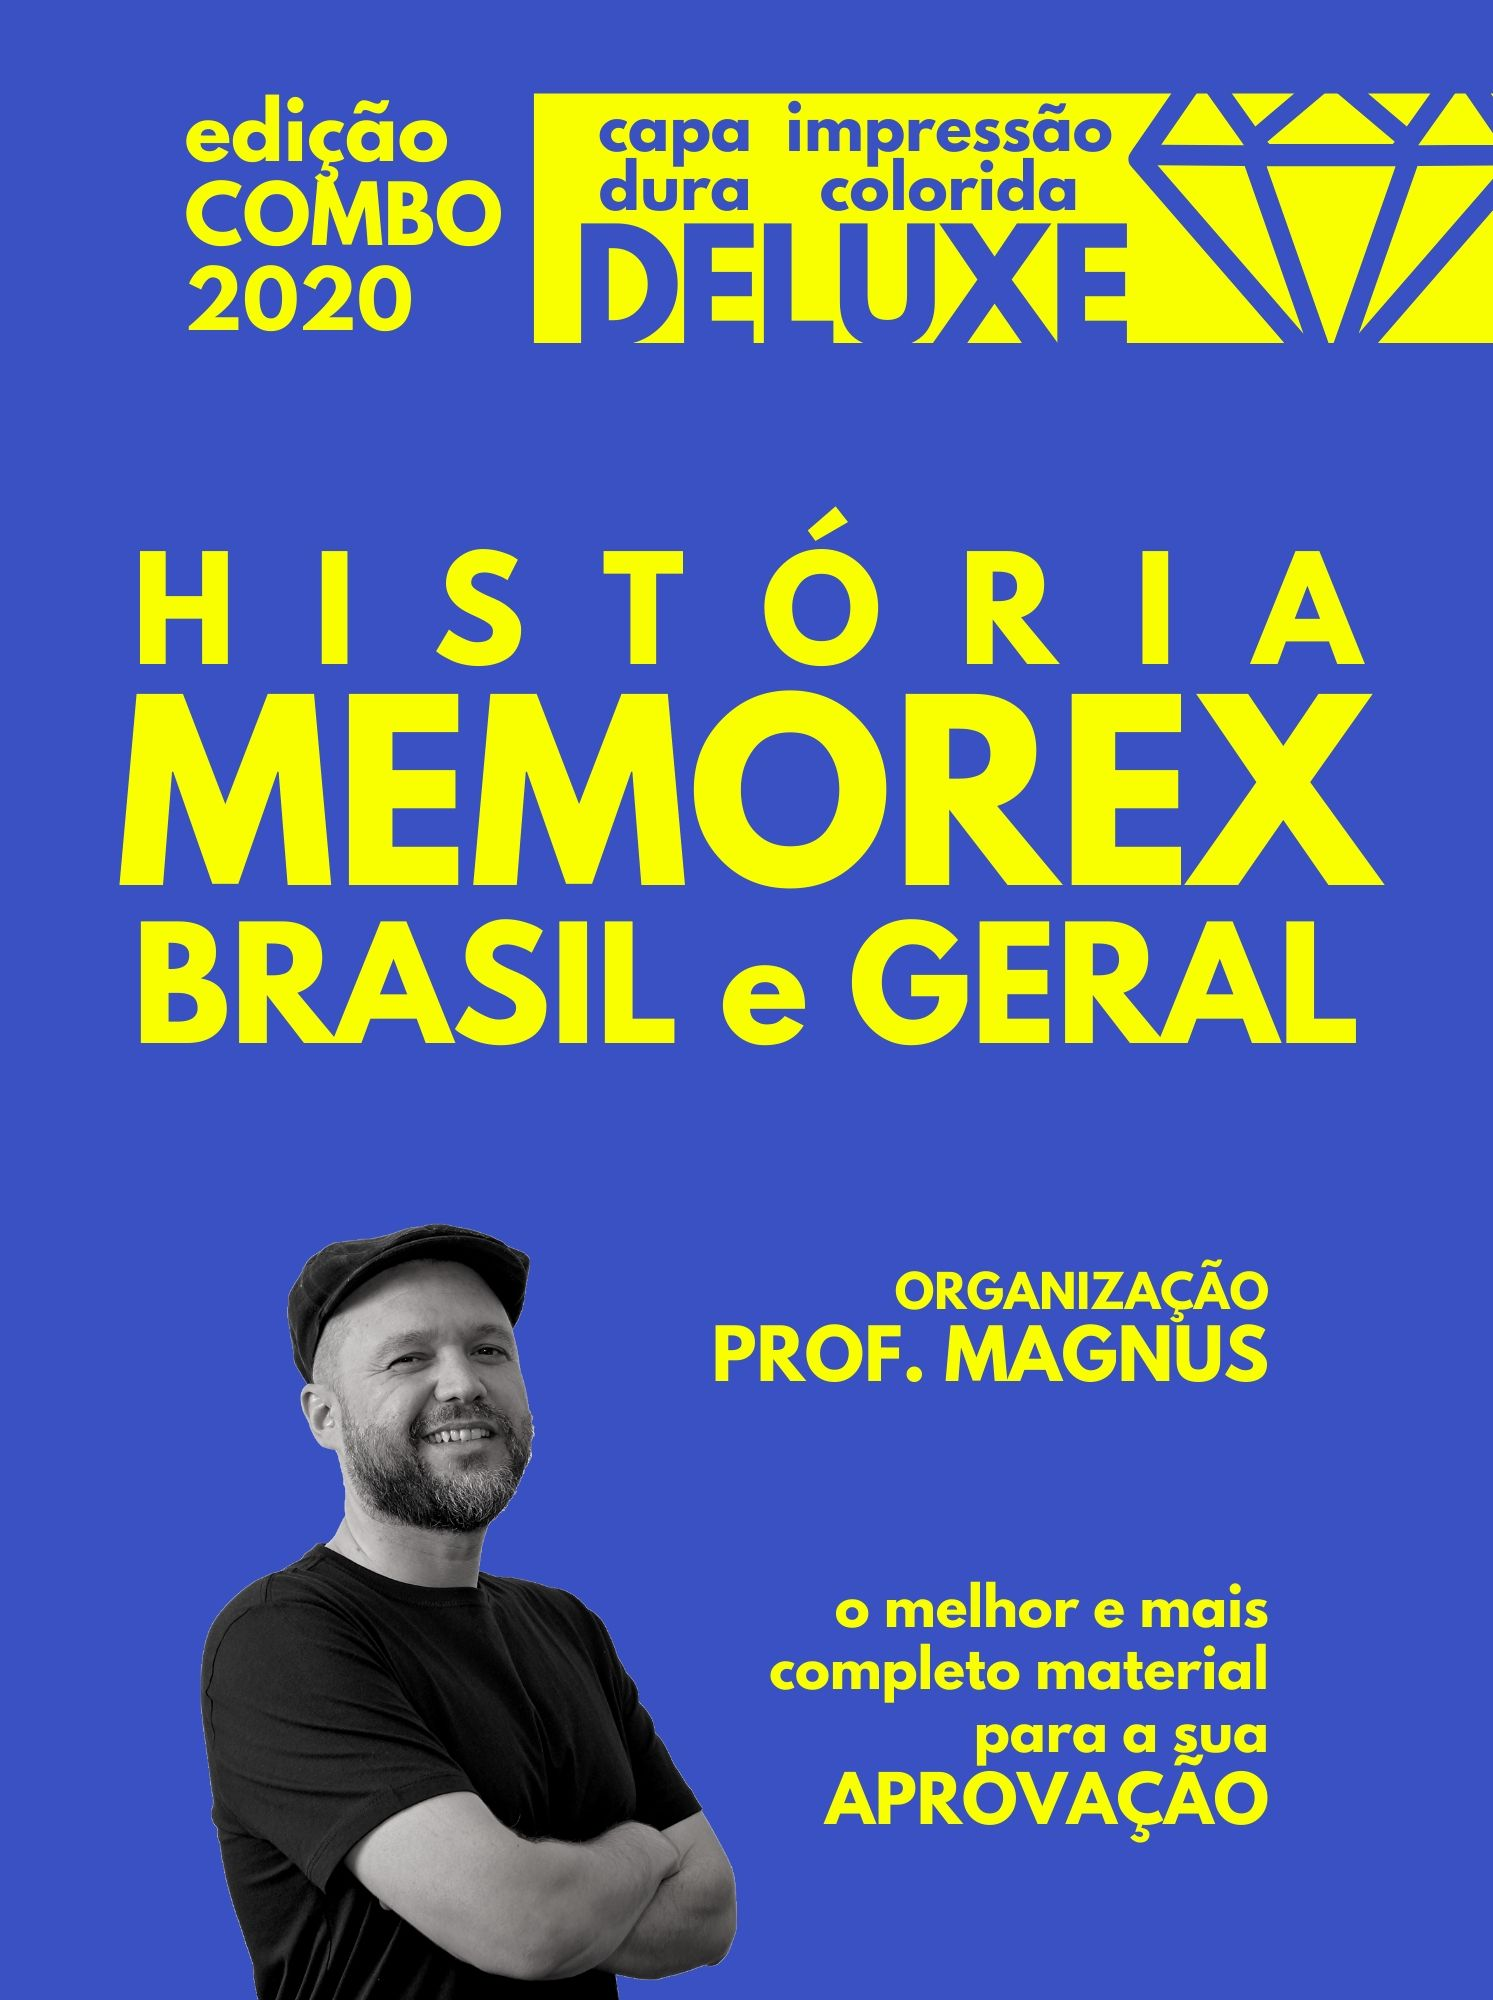 COMBO MEMOREX: Brasil e Geral (ed. deluxe)